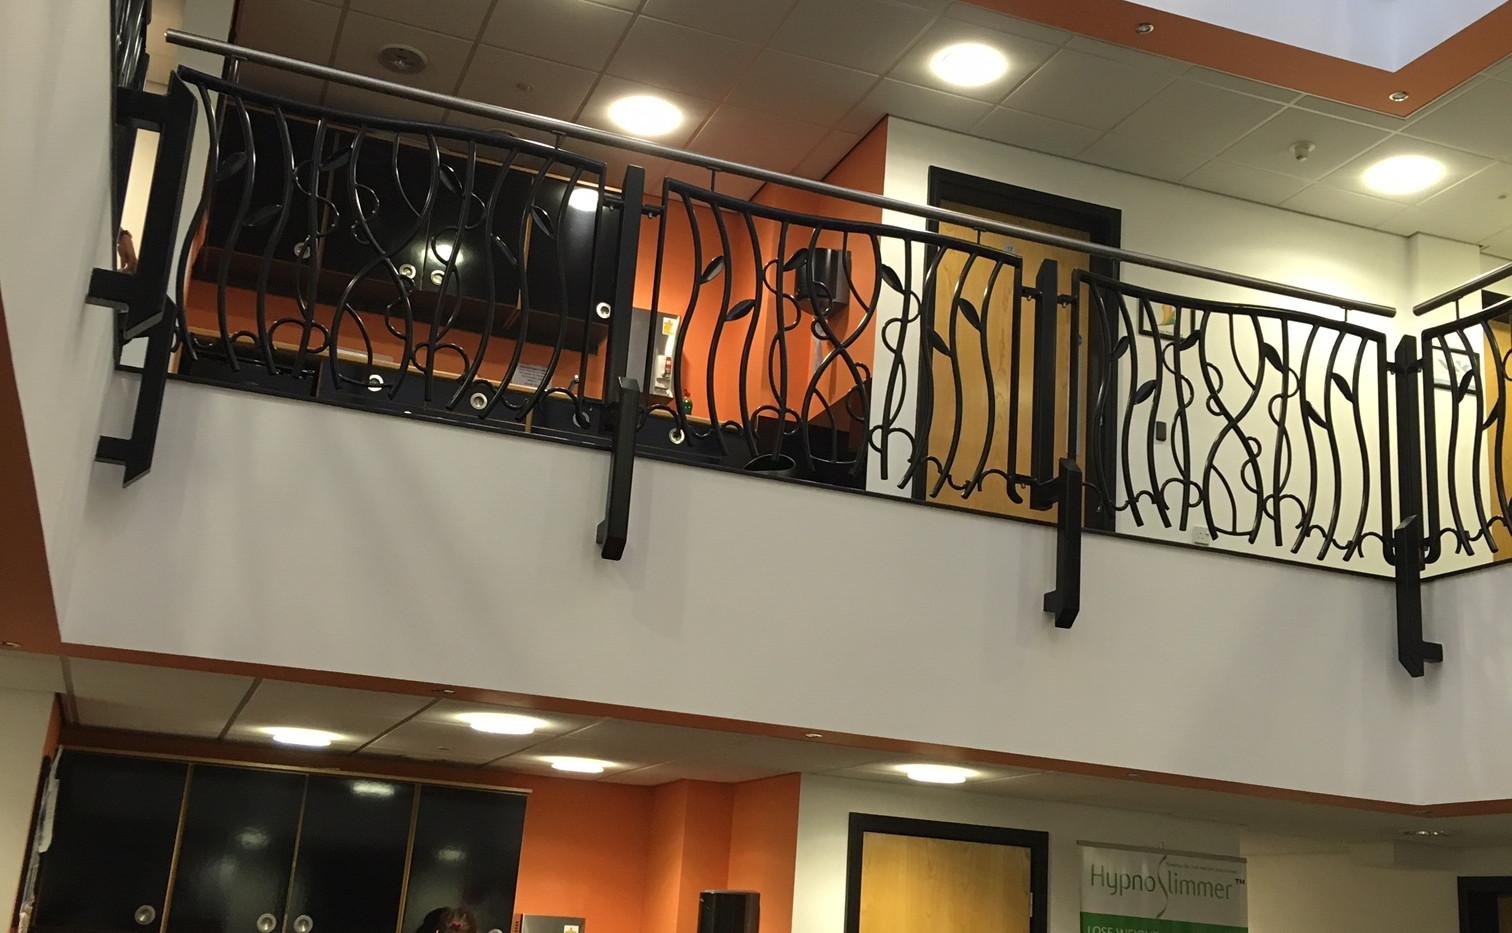 atrium links care training fusion rother